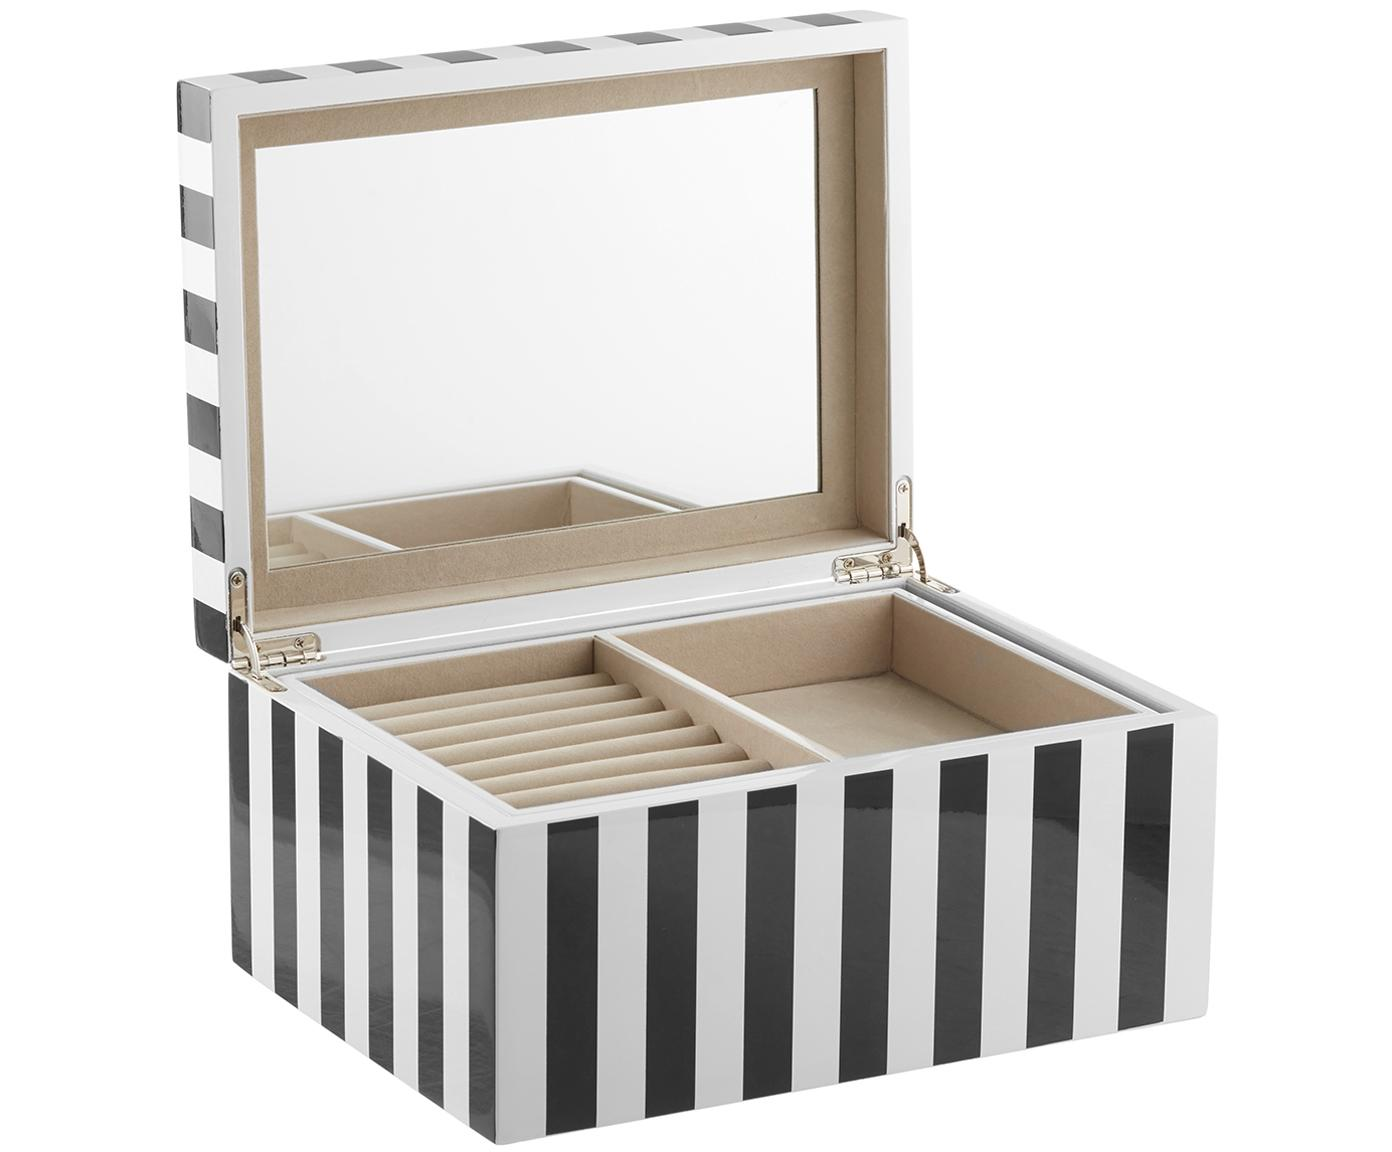 Joyero Taylor con espejo, Negro/blanco a rayas, An 26 x Al 13 cm